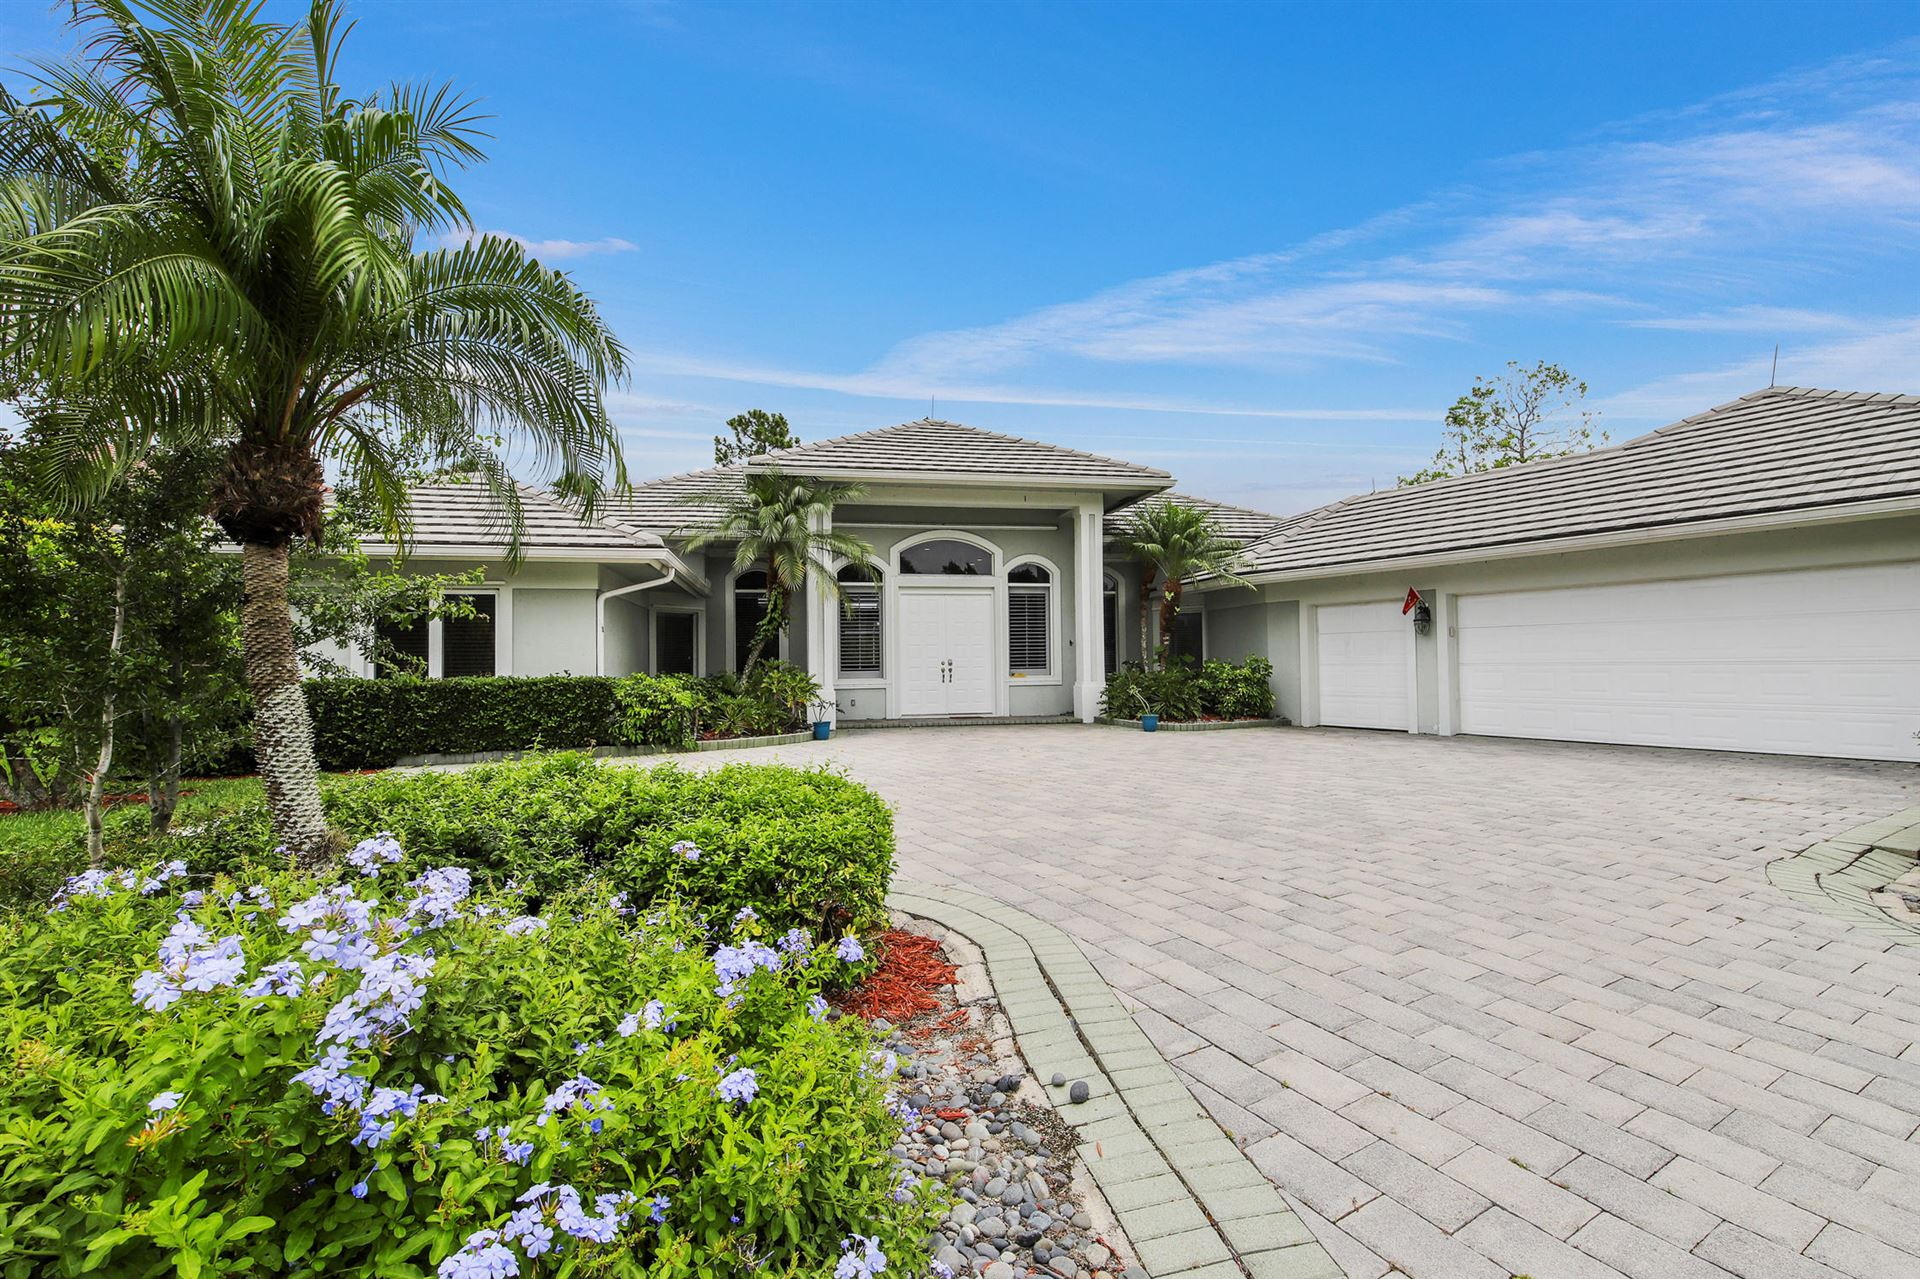 Photo of 284 SW Squire Johns Lane, Palm City, FL 34990 (MLS # RX-10627815)